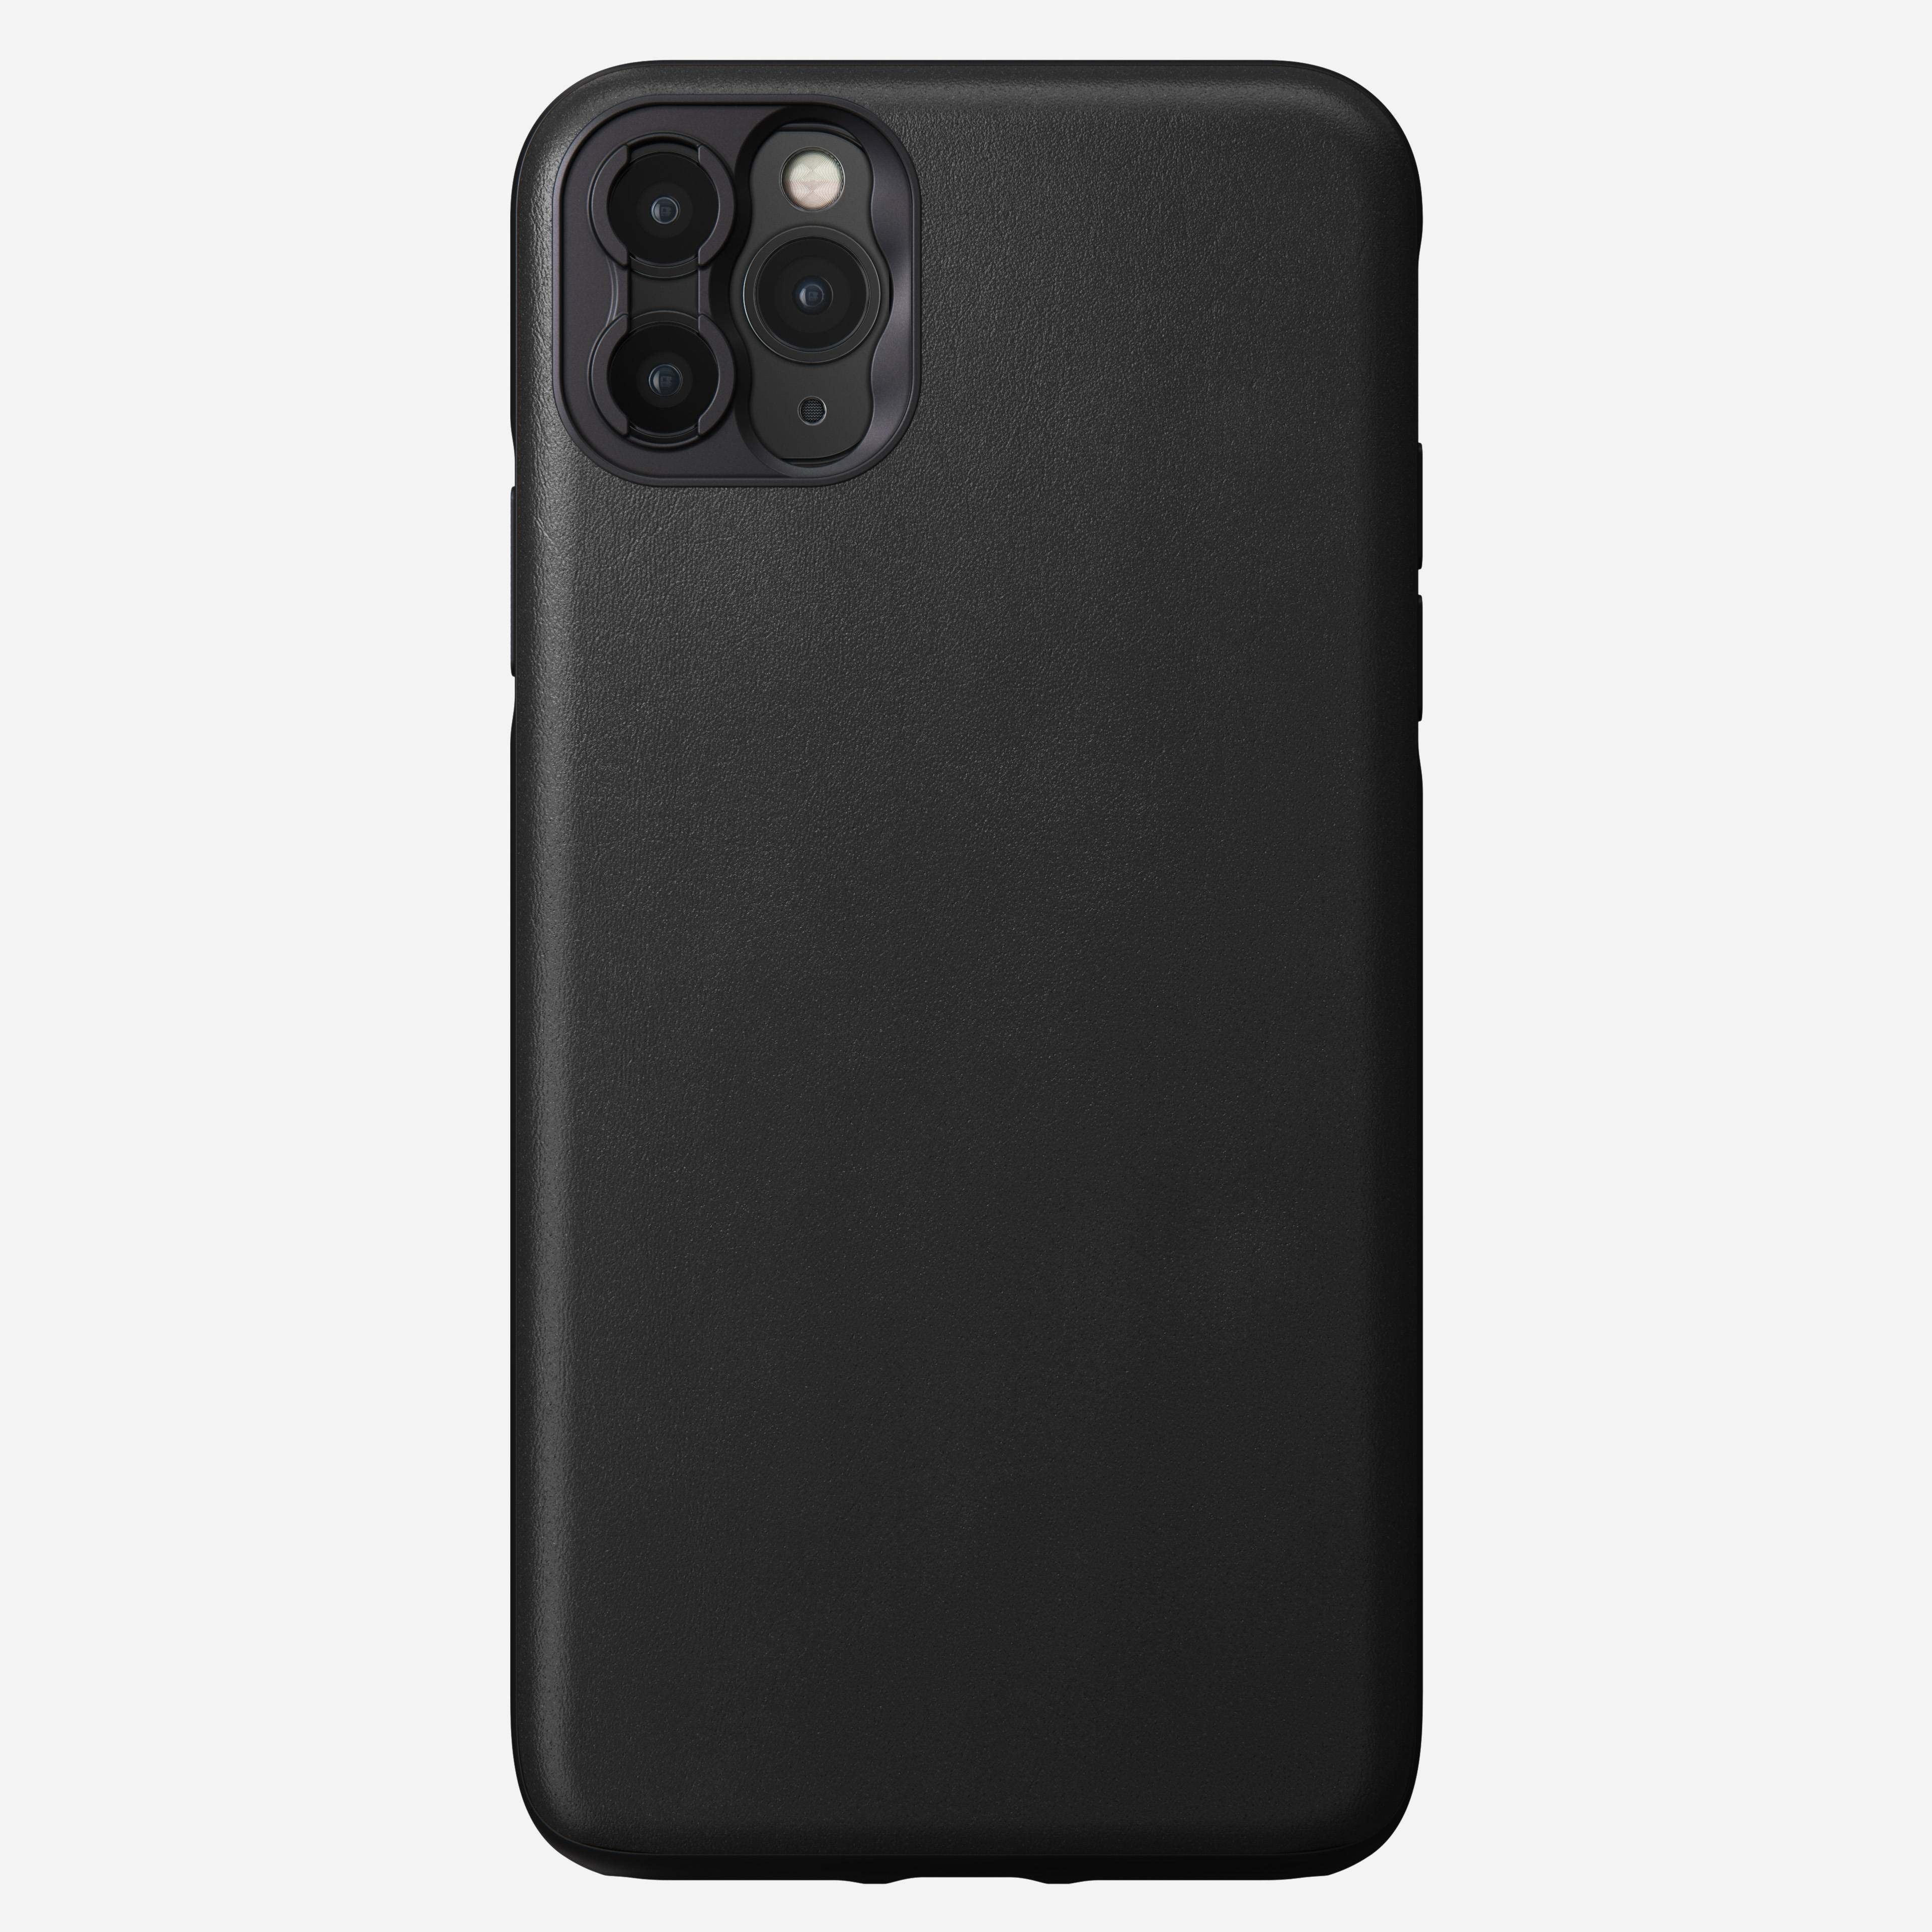 Rugged case black moment 11 pro max